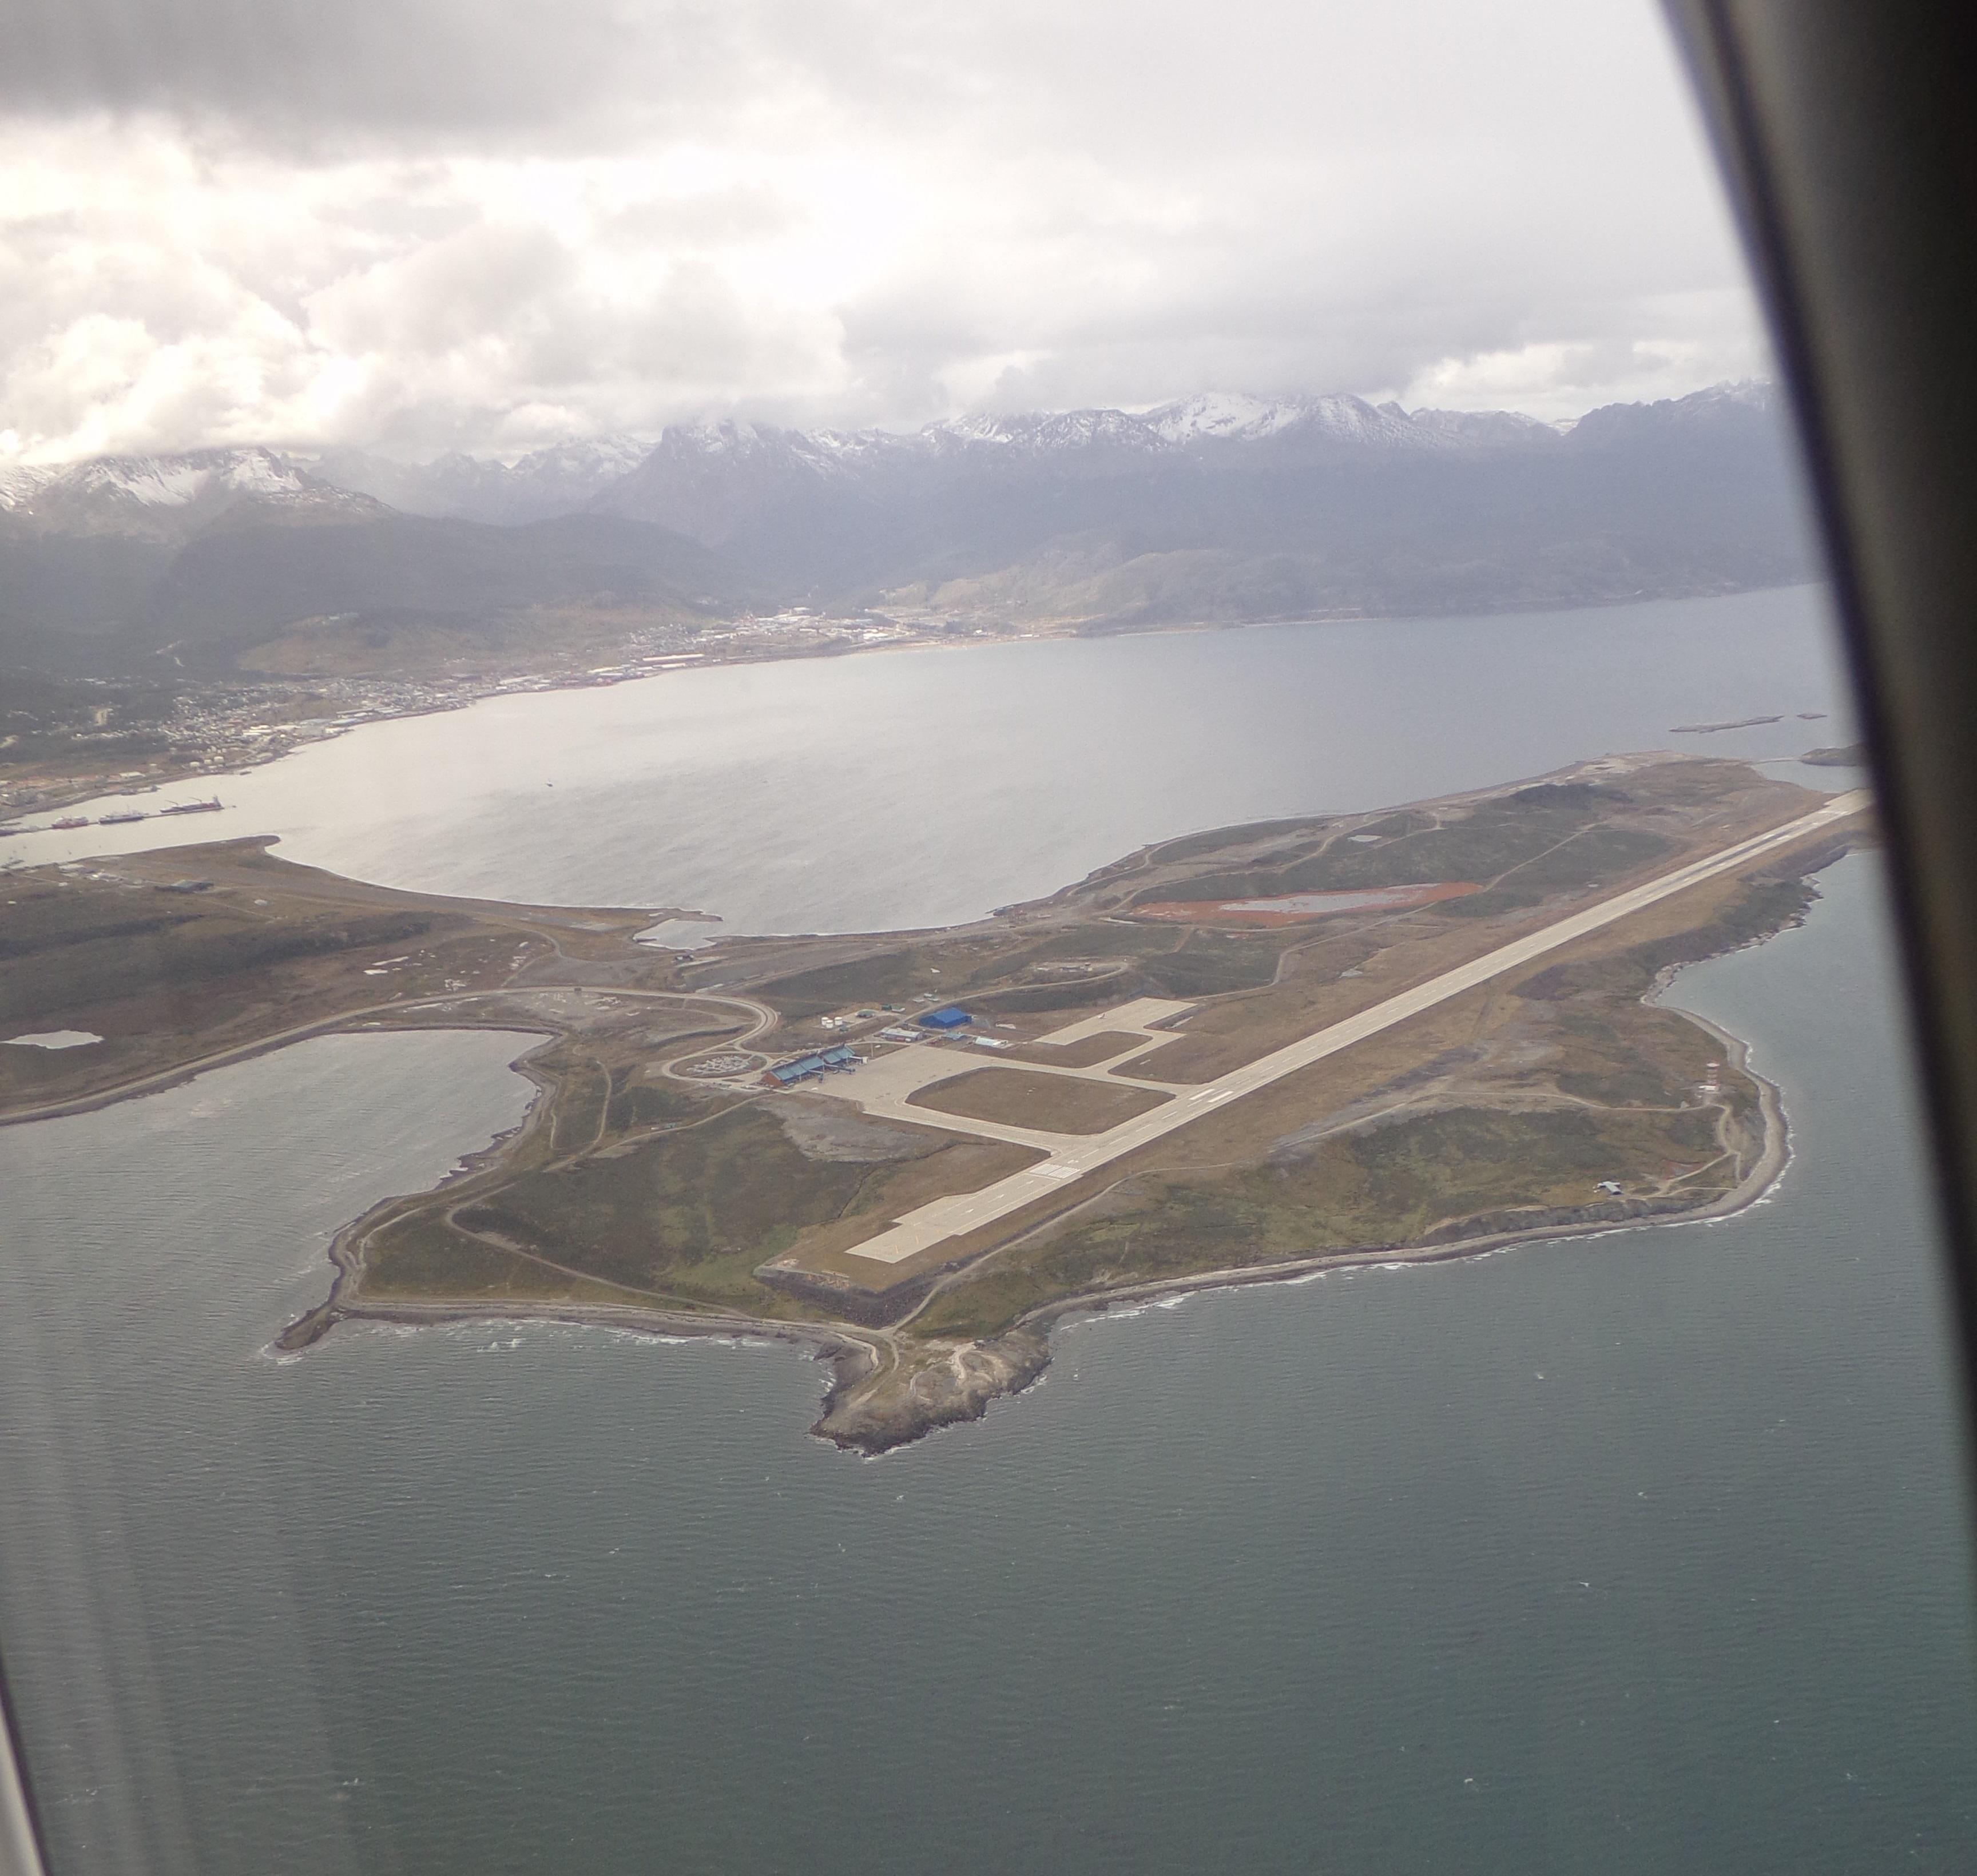 Aeroporto Ushuaia : File aeropuerto malvinas argentinas ushuaia vista aérea